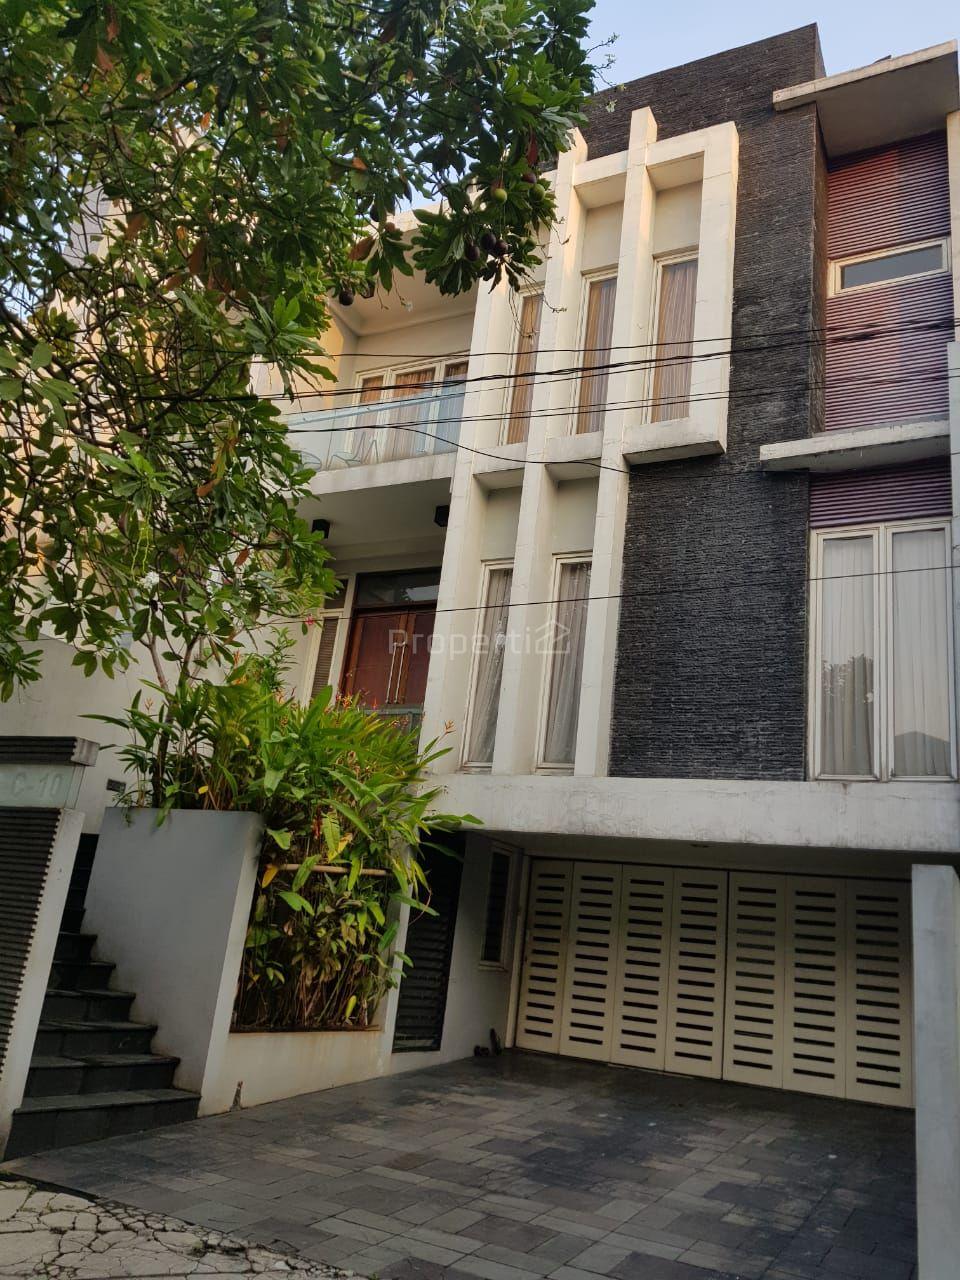 Rumah Villa Pondok Indah di Kebayoran Lama, Jakarta Selatan, DKI Jakarta